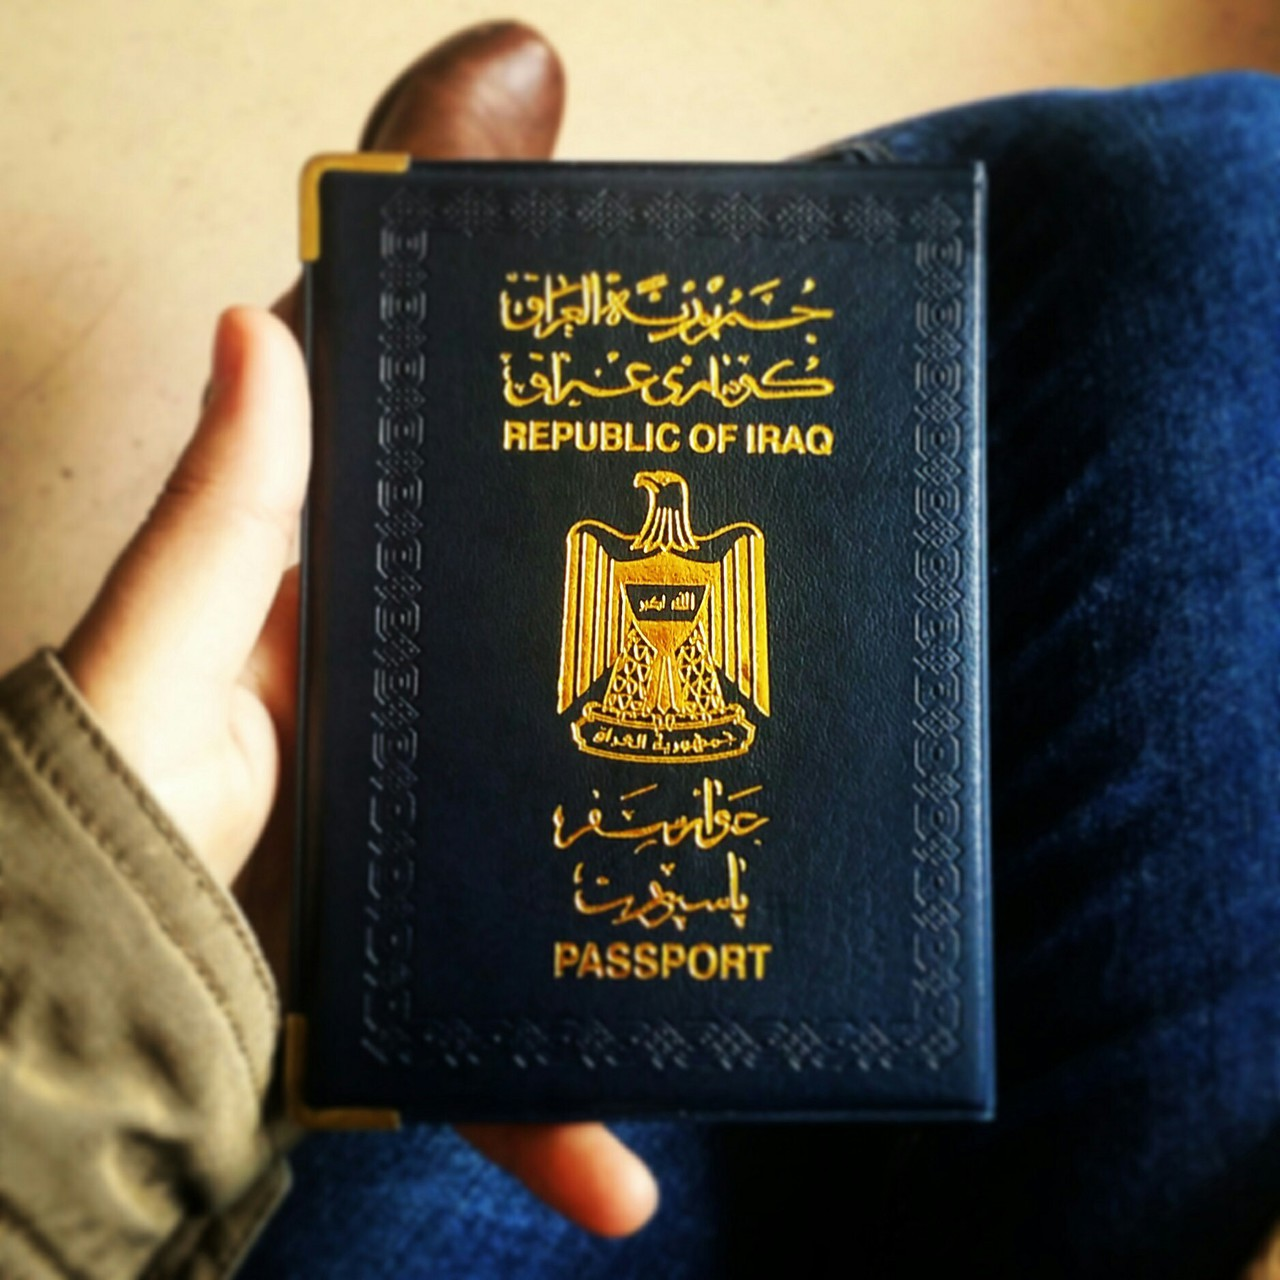 بالصور رمزيات سفر , صور متعدده عن السفر 452 8